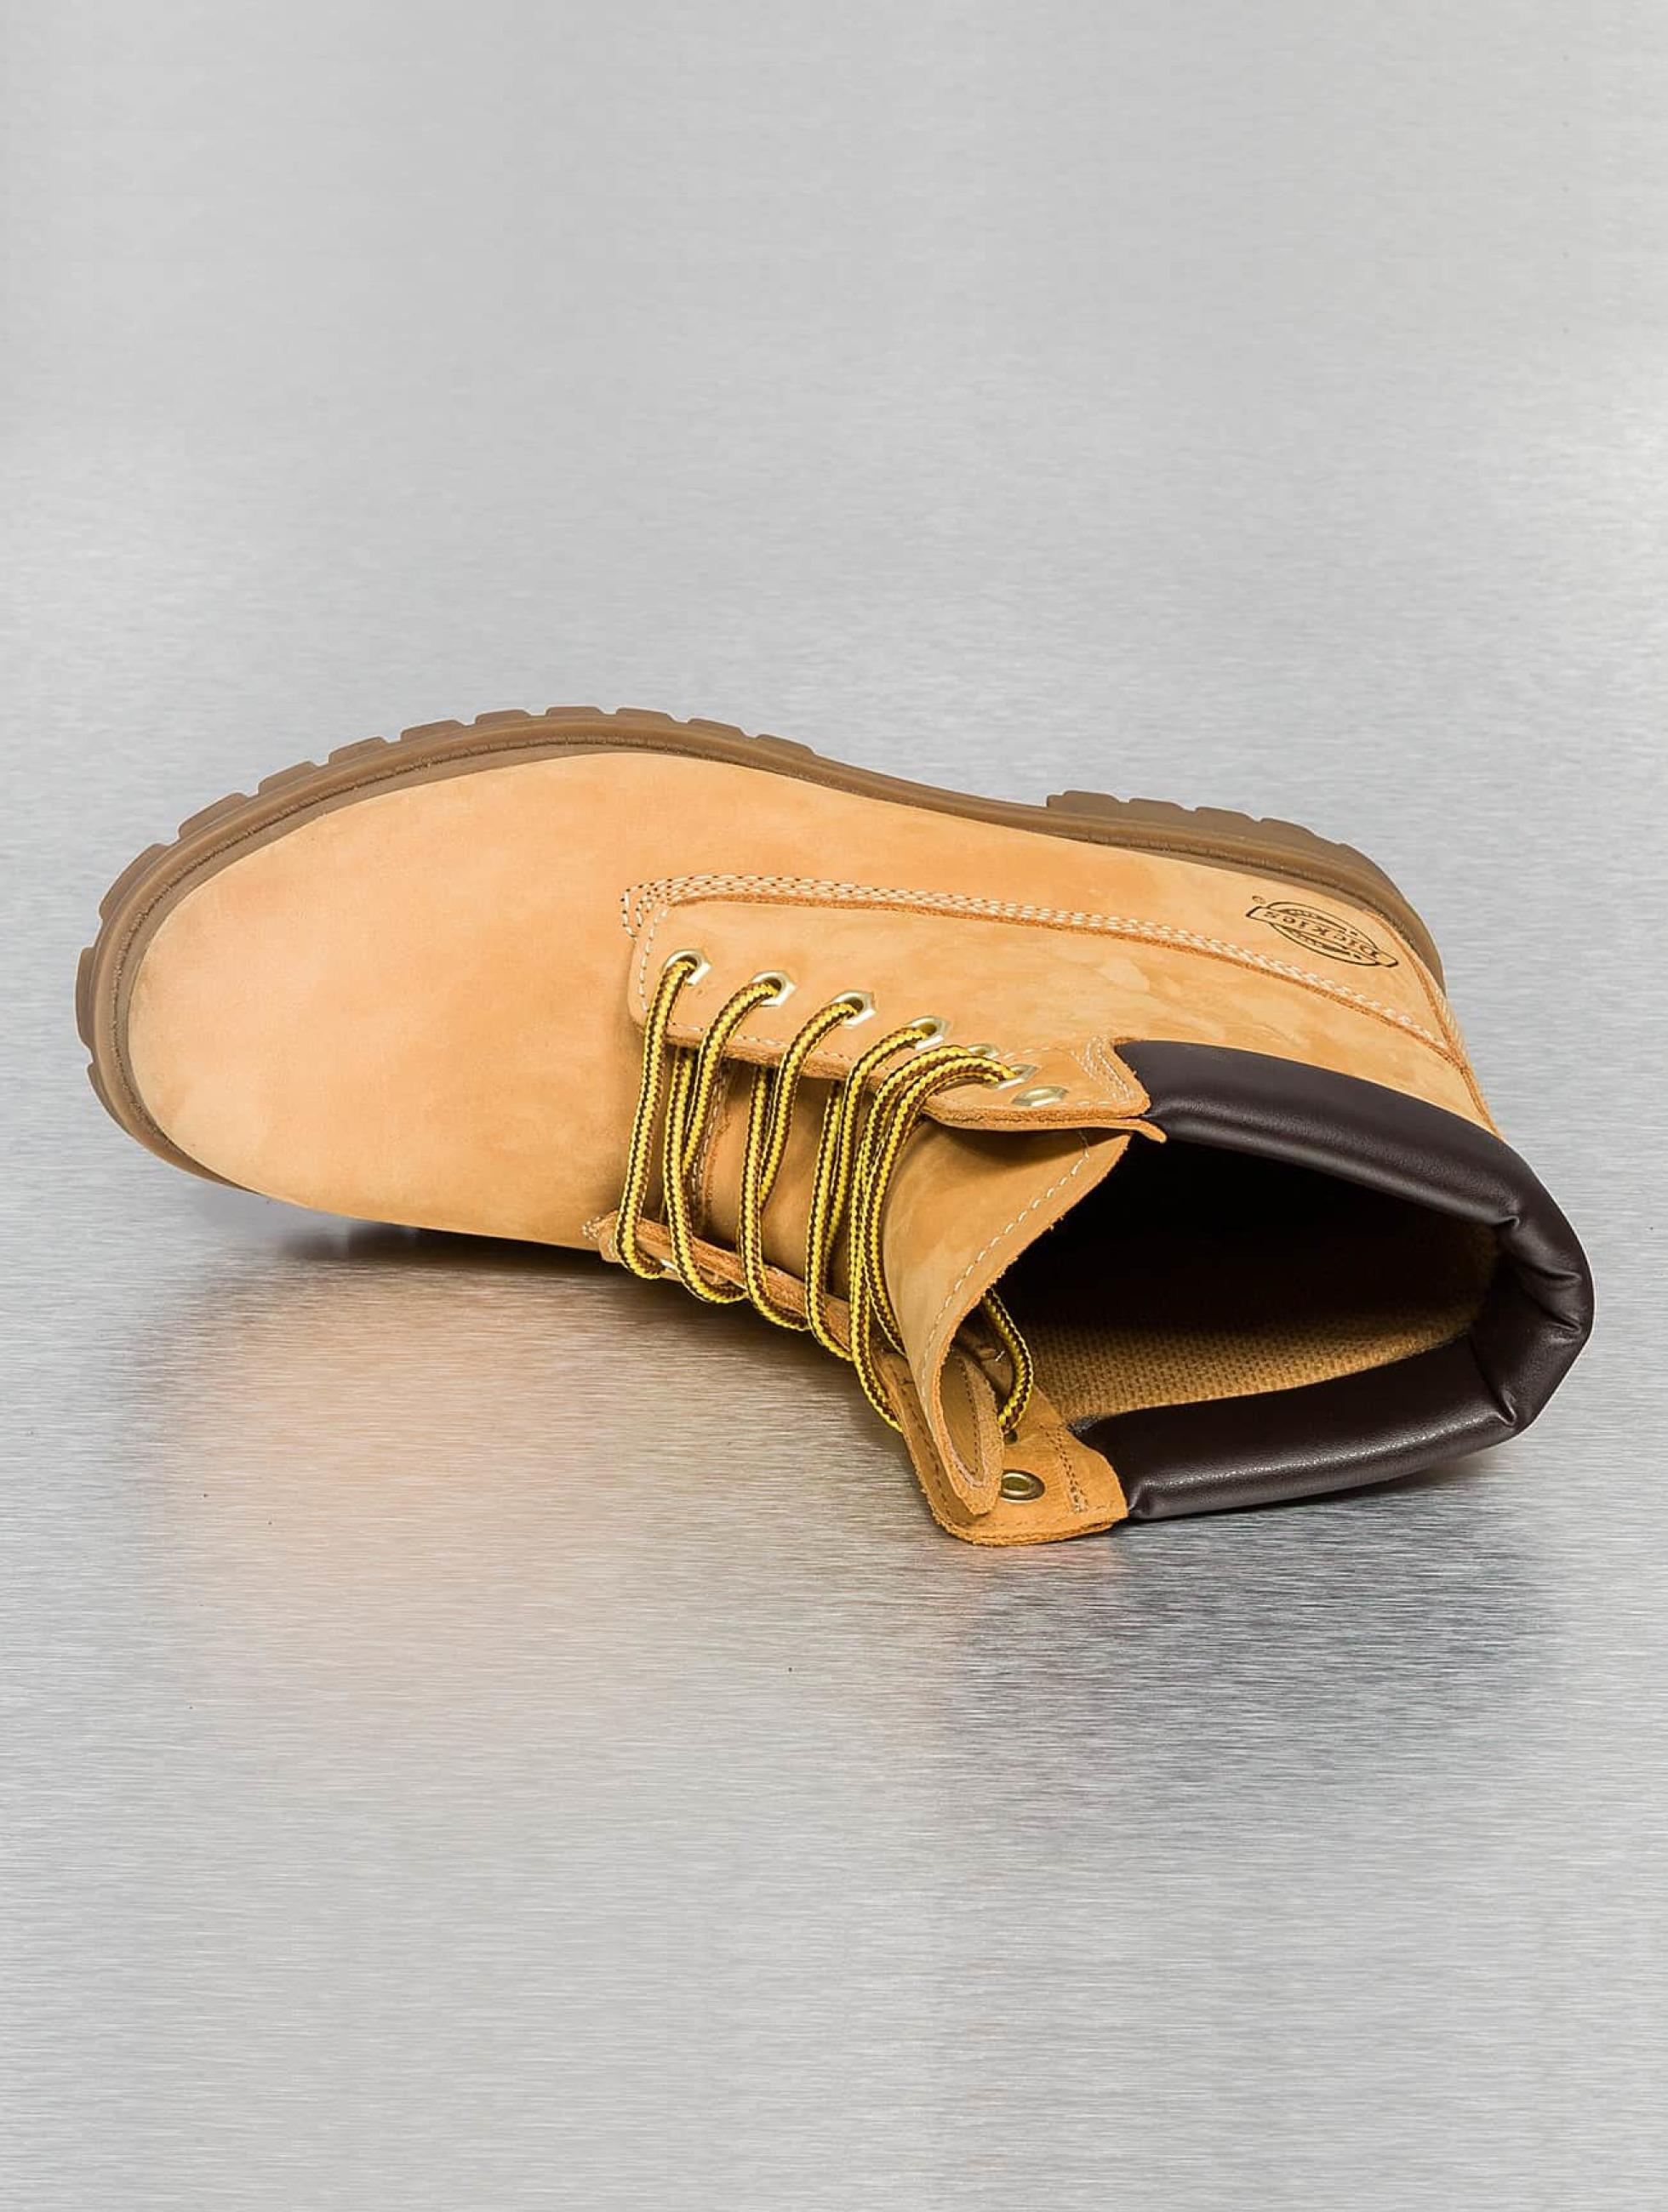 Dickies Herren Schuhe Boots / Boots Schuhe Fort Worth 7758c8